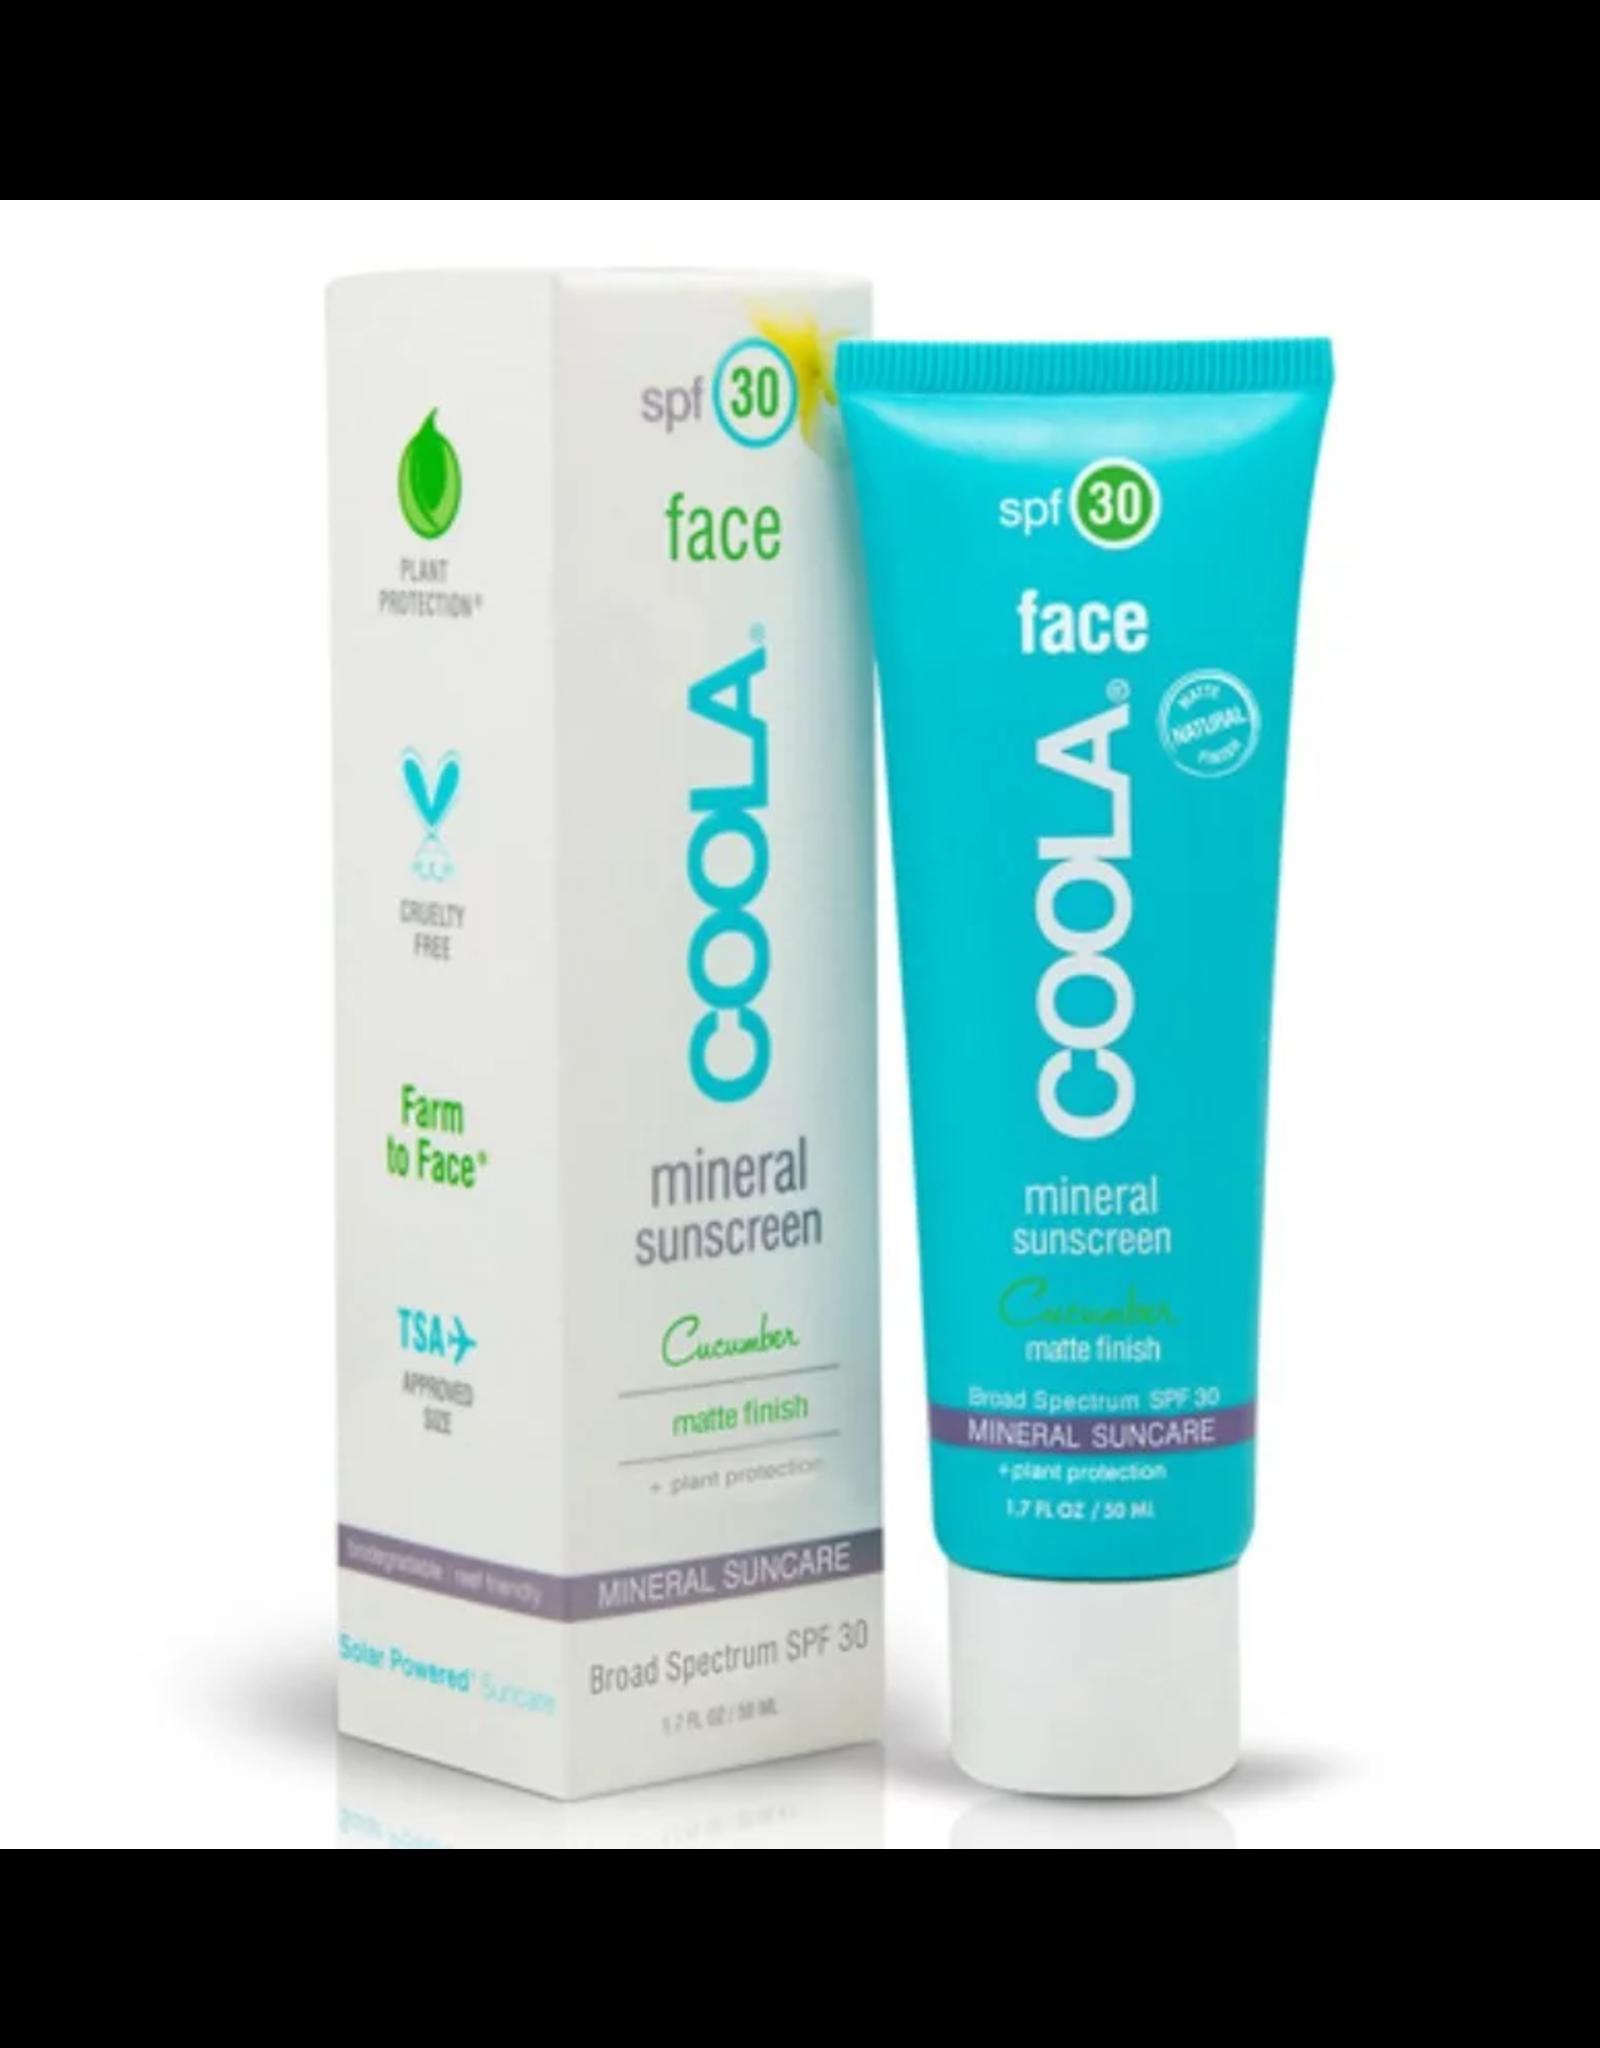 COOLA Face Mineral Sunscreen SPF 30 Cucumber Matte Finish